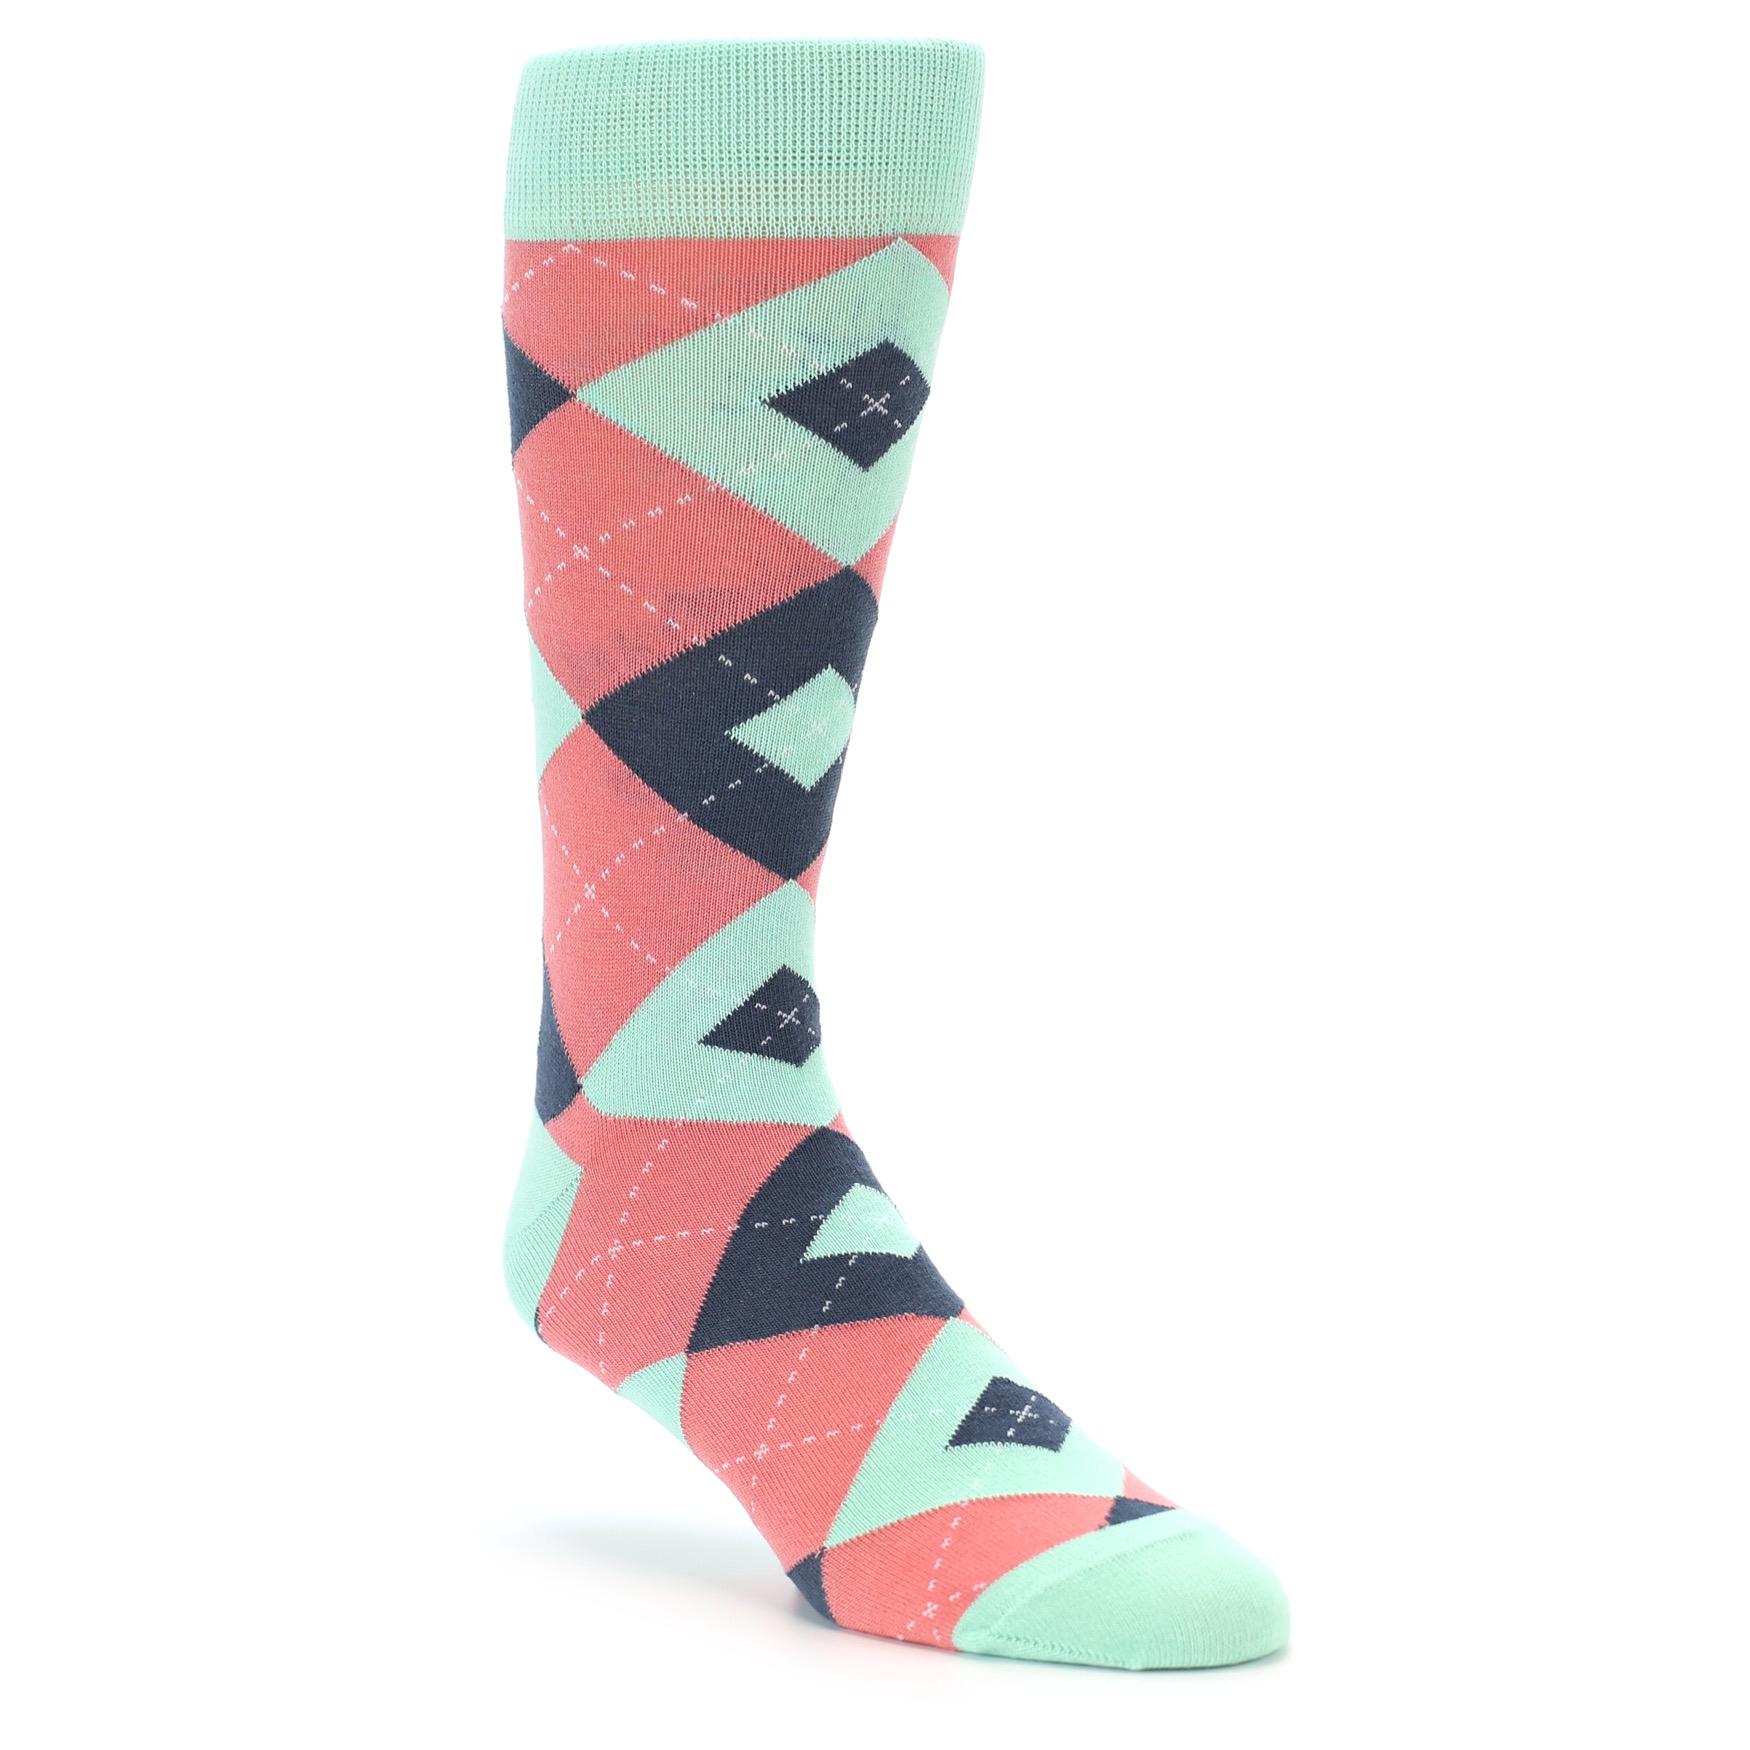 Coral Mint Argyle Wedding Groomsmen Men's Dress Socks